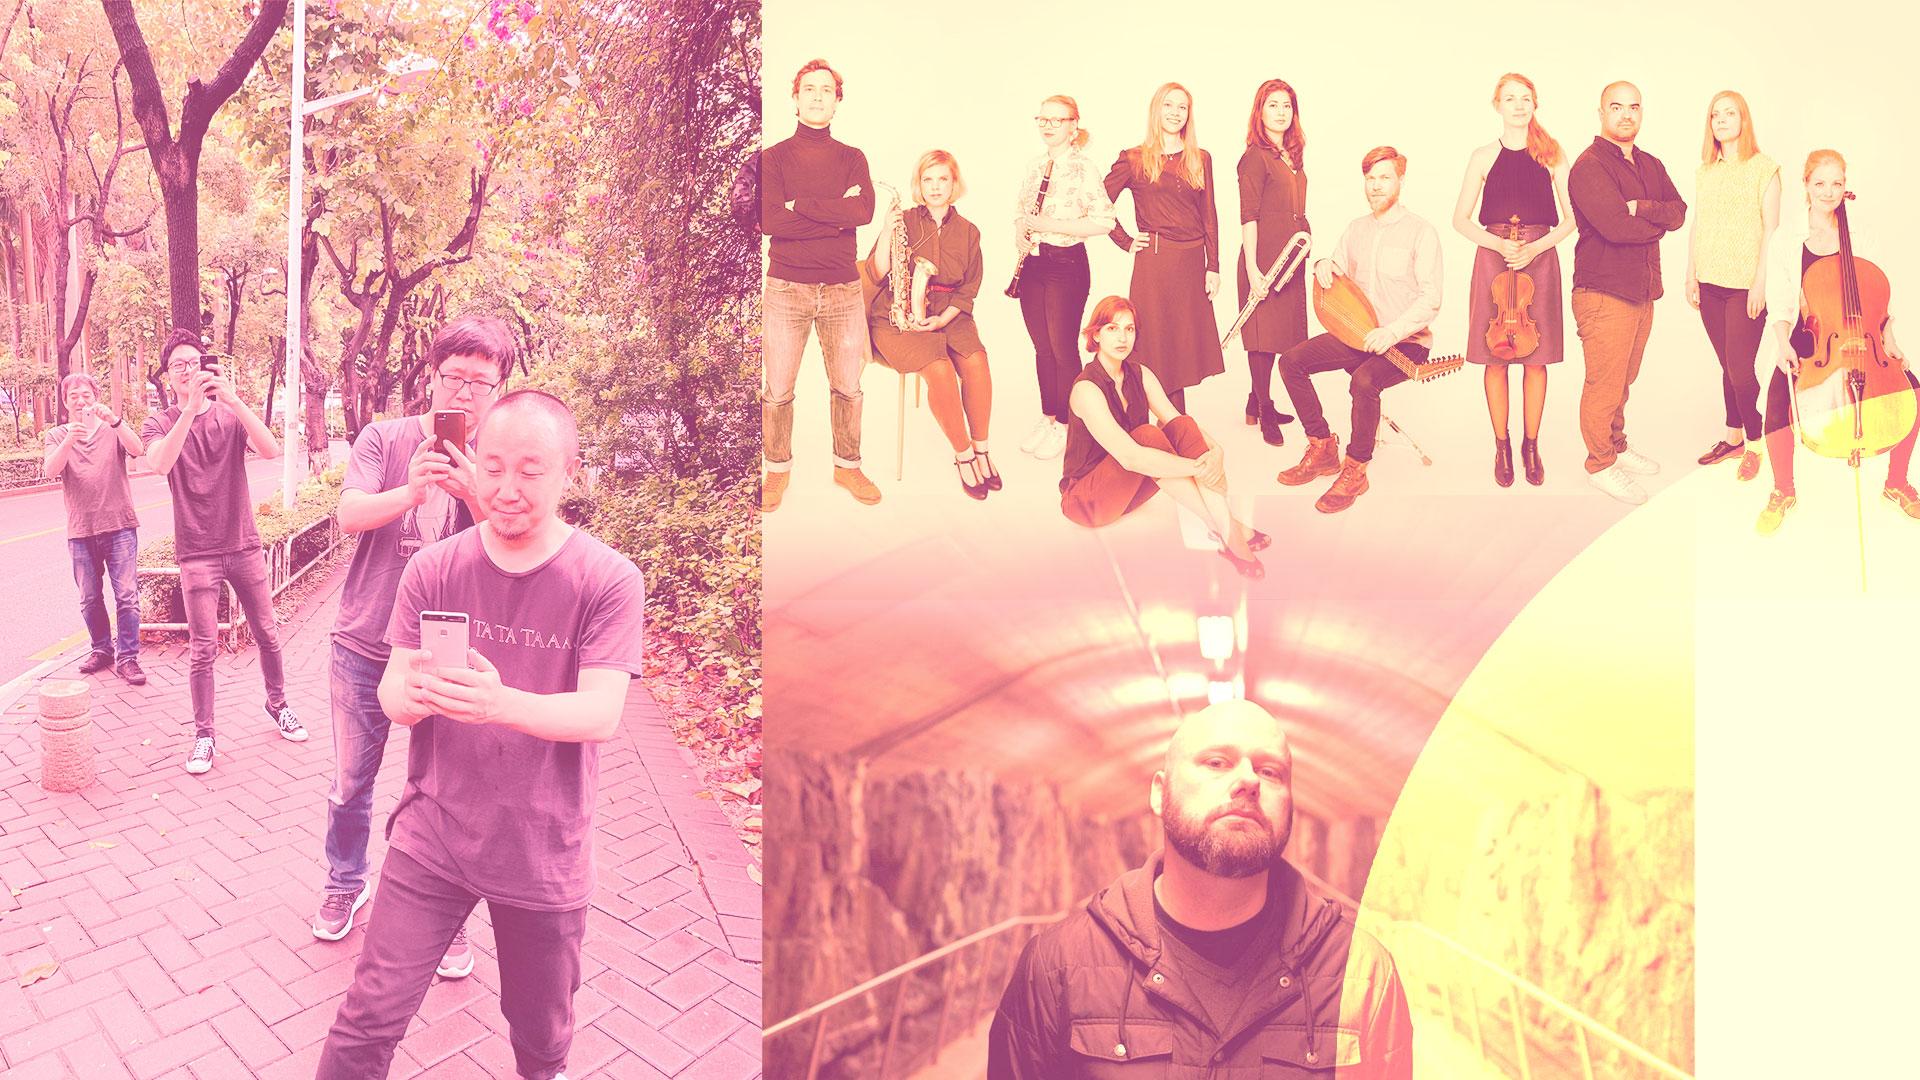 FEN/Lasse Marhaug/Ensemble neoN – Fractured times. A Reunion of Strangers. thumbnail